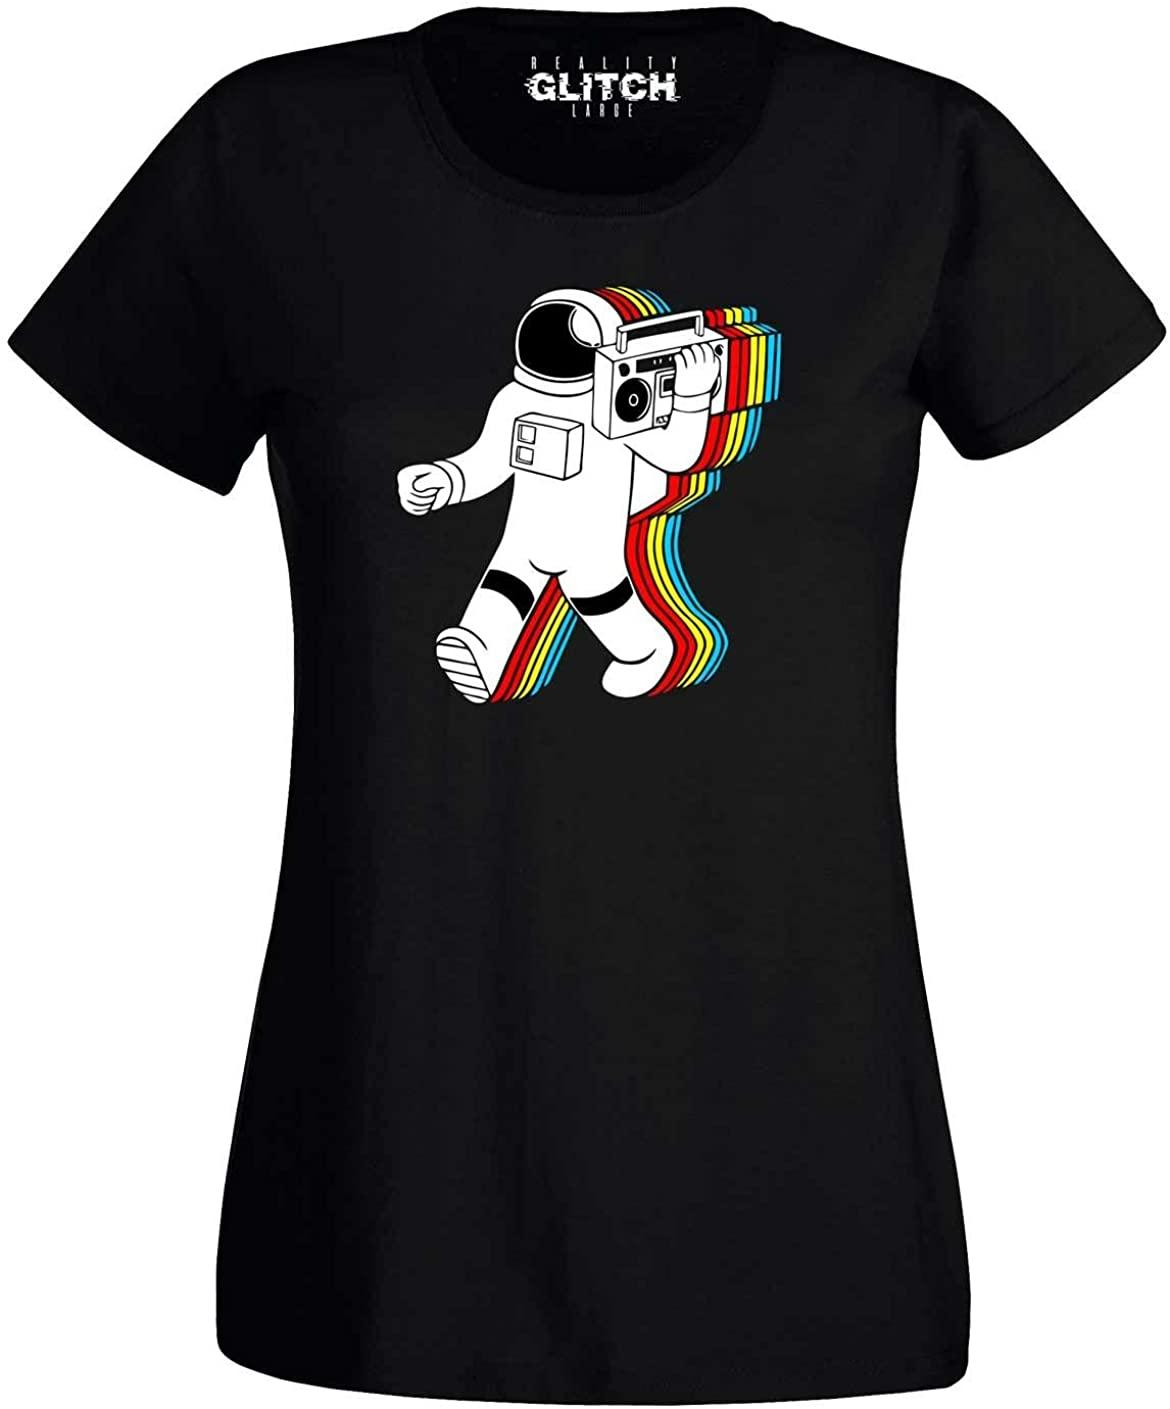 Reality Glitch Women's Funky Spaceman T-Shirt